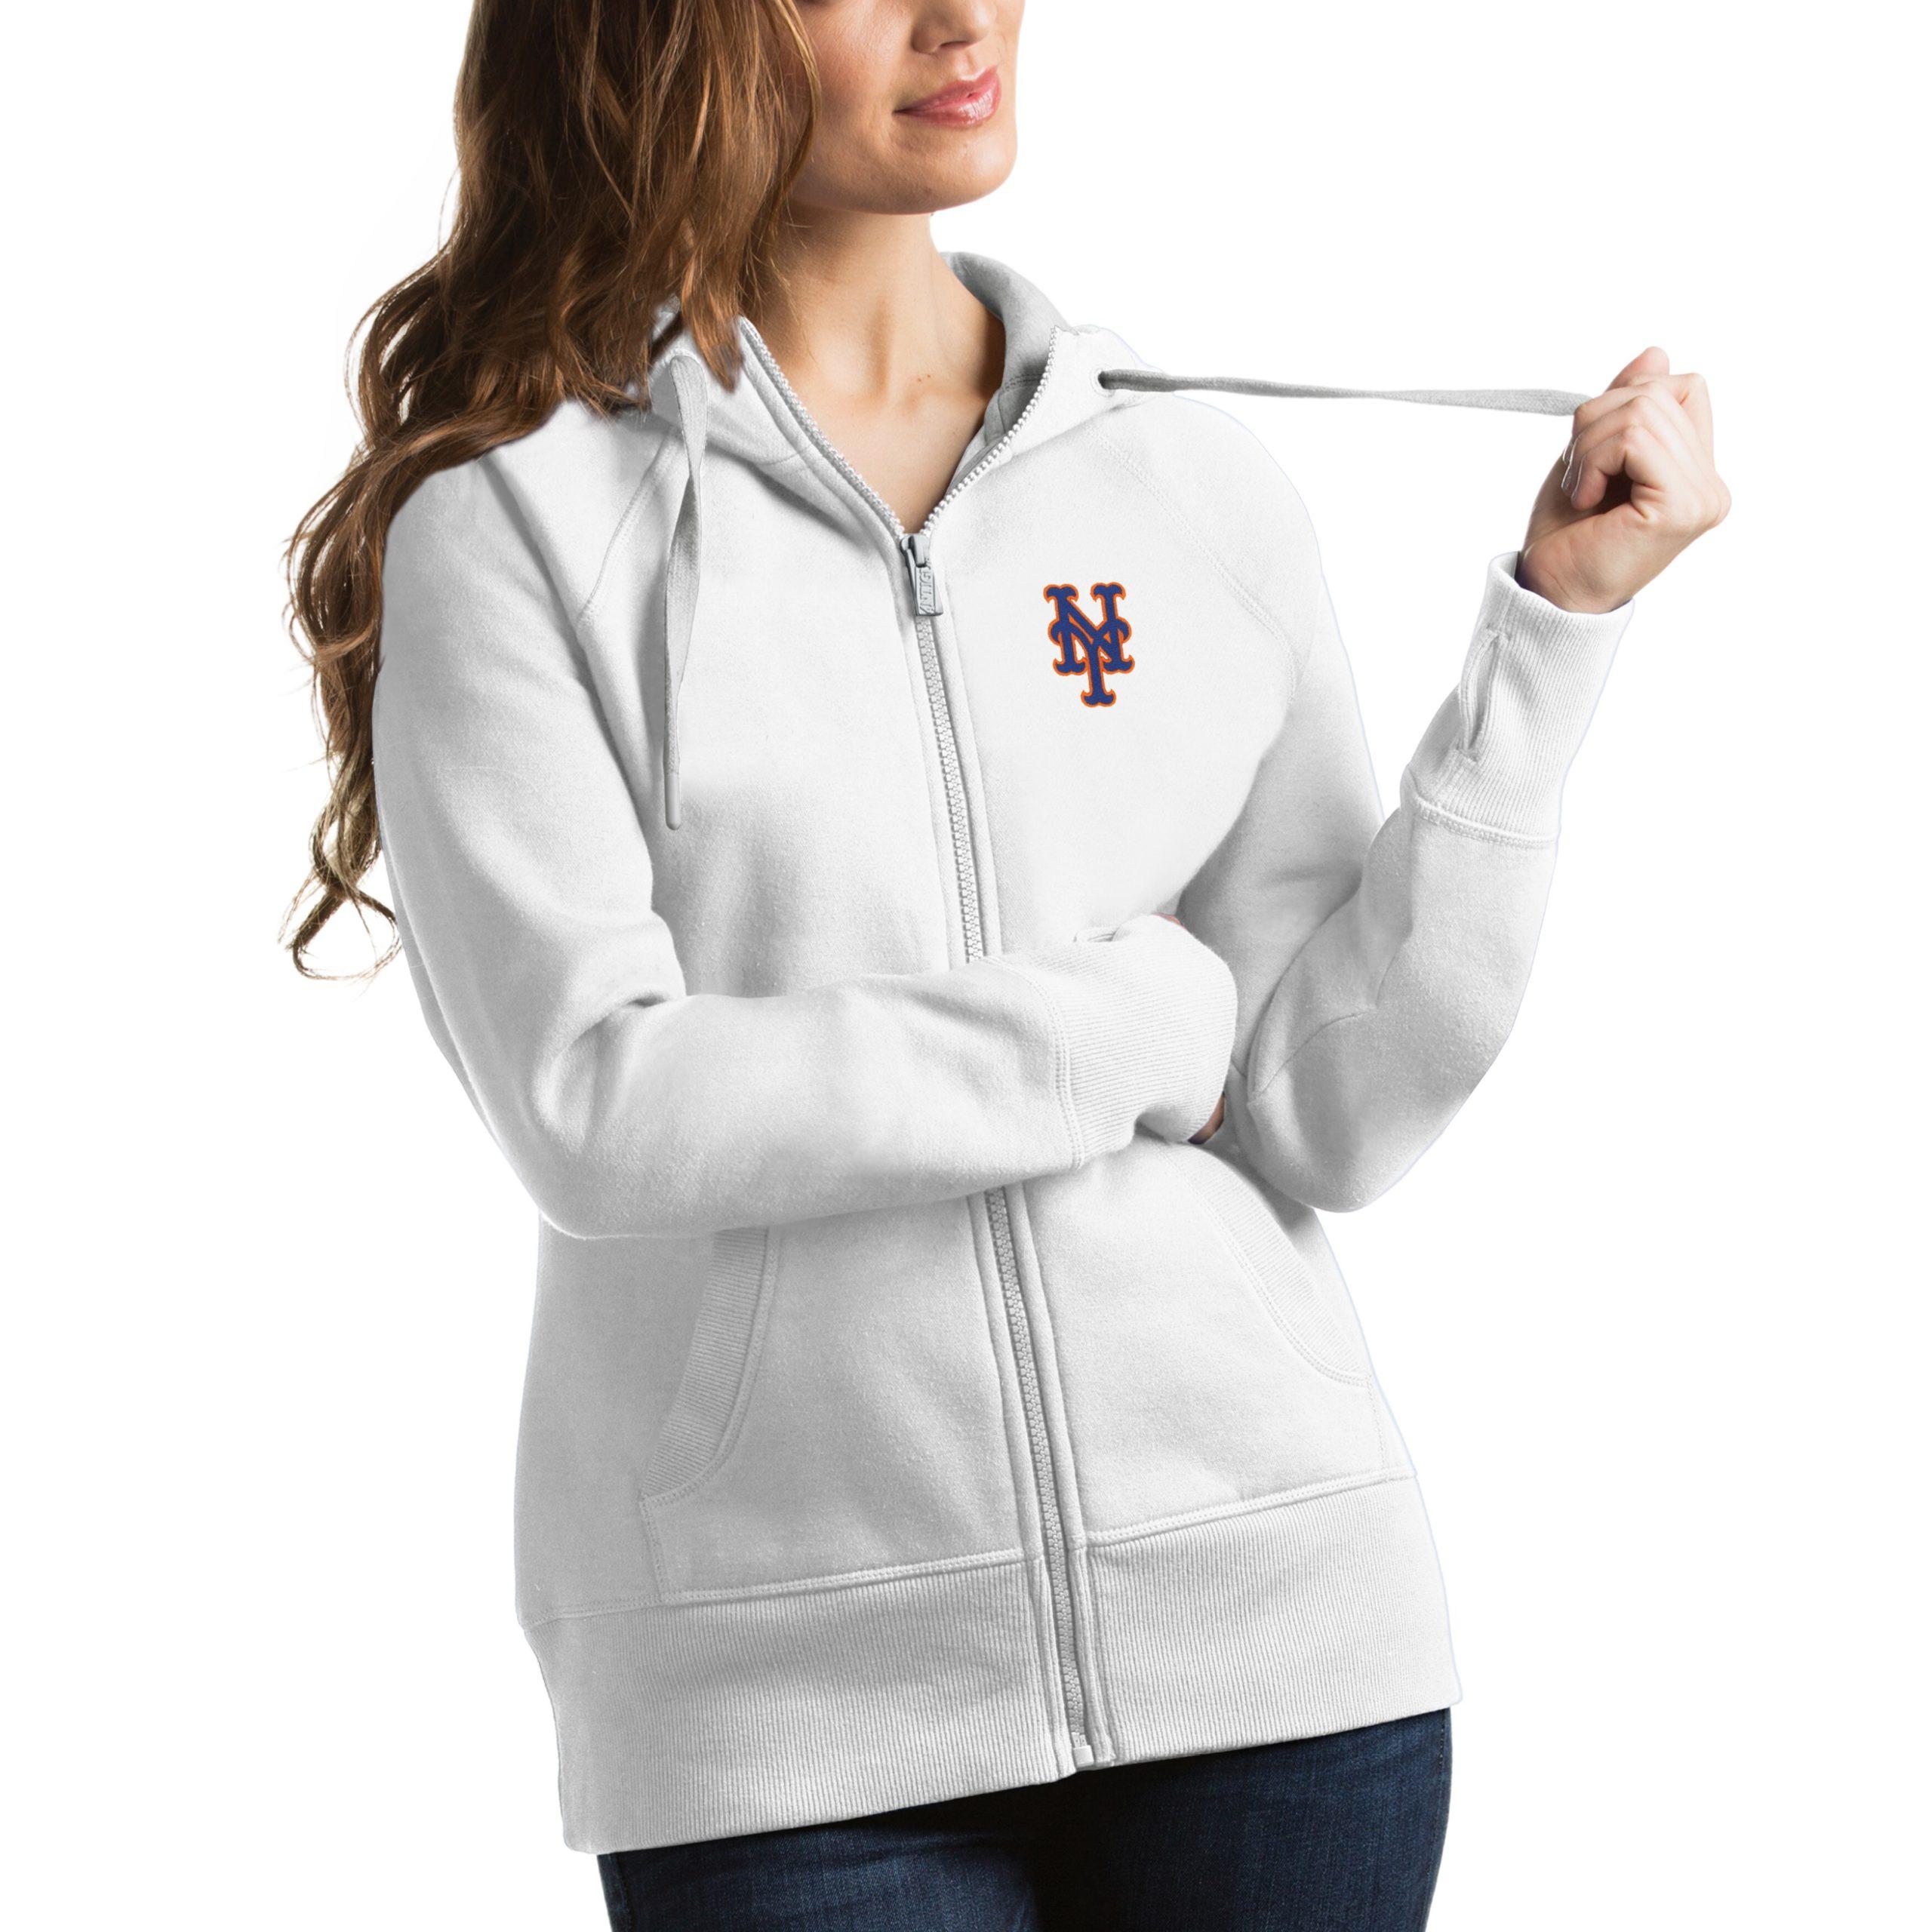 New York Mets Antigua Women's Victory Full-Zip Hoodie - White